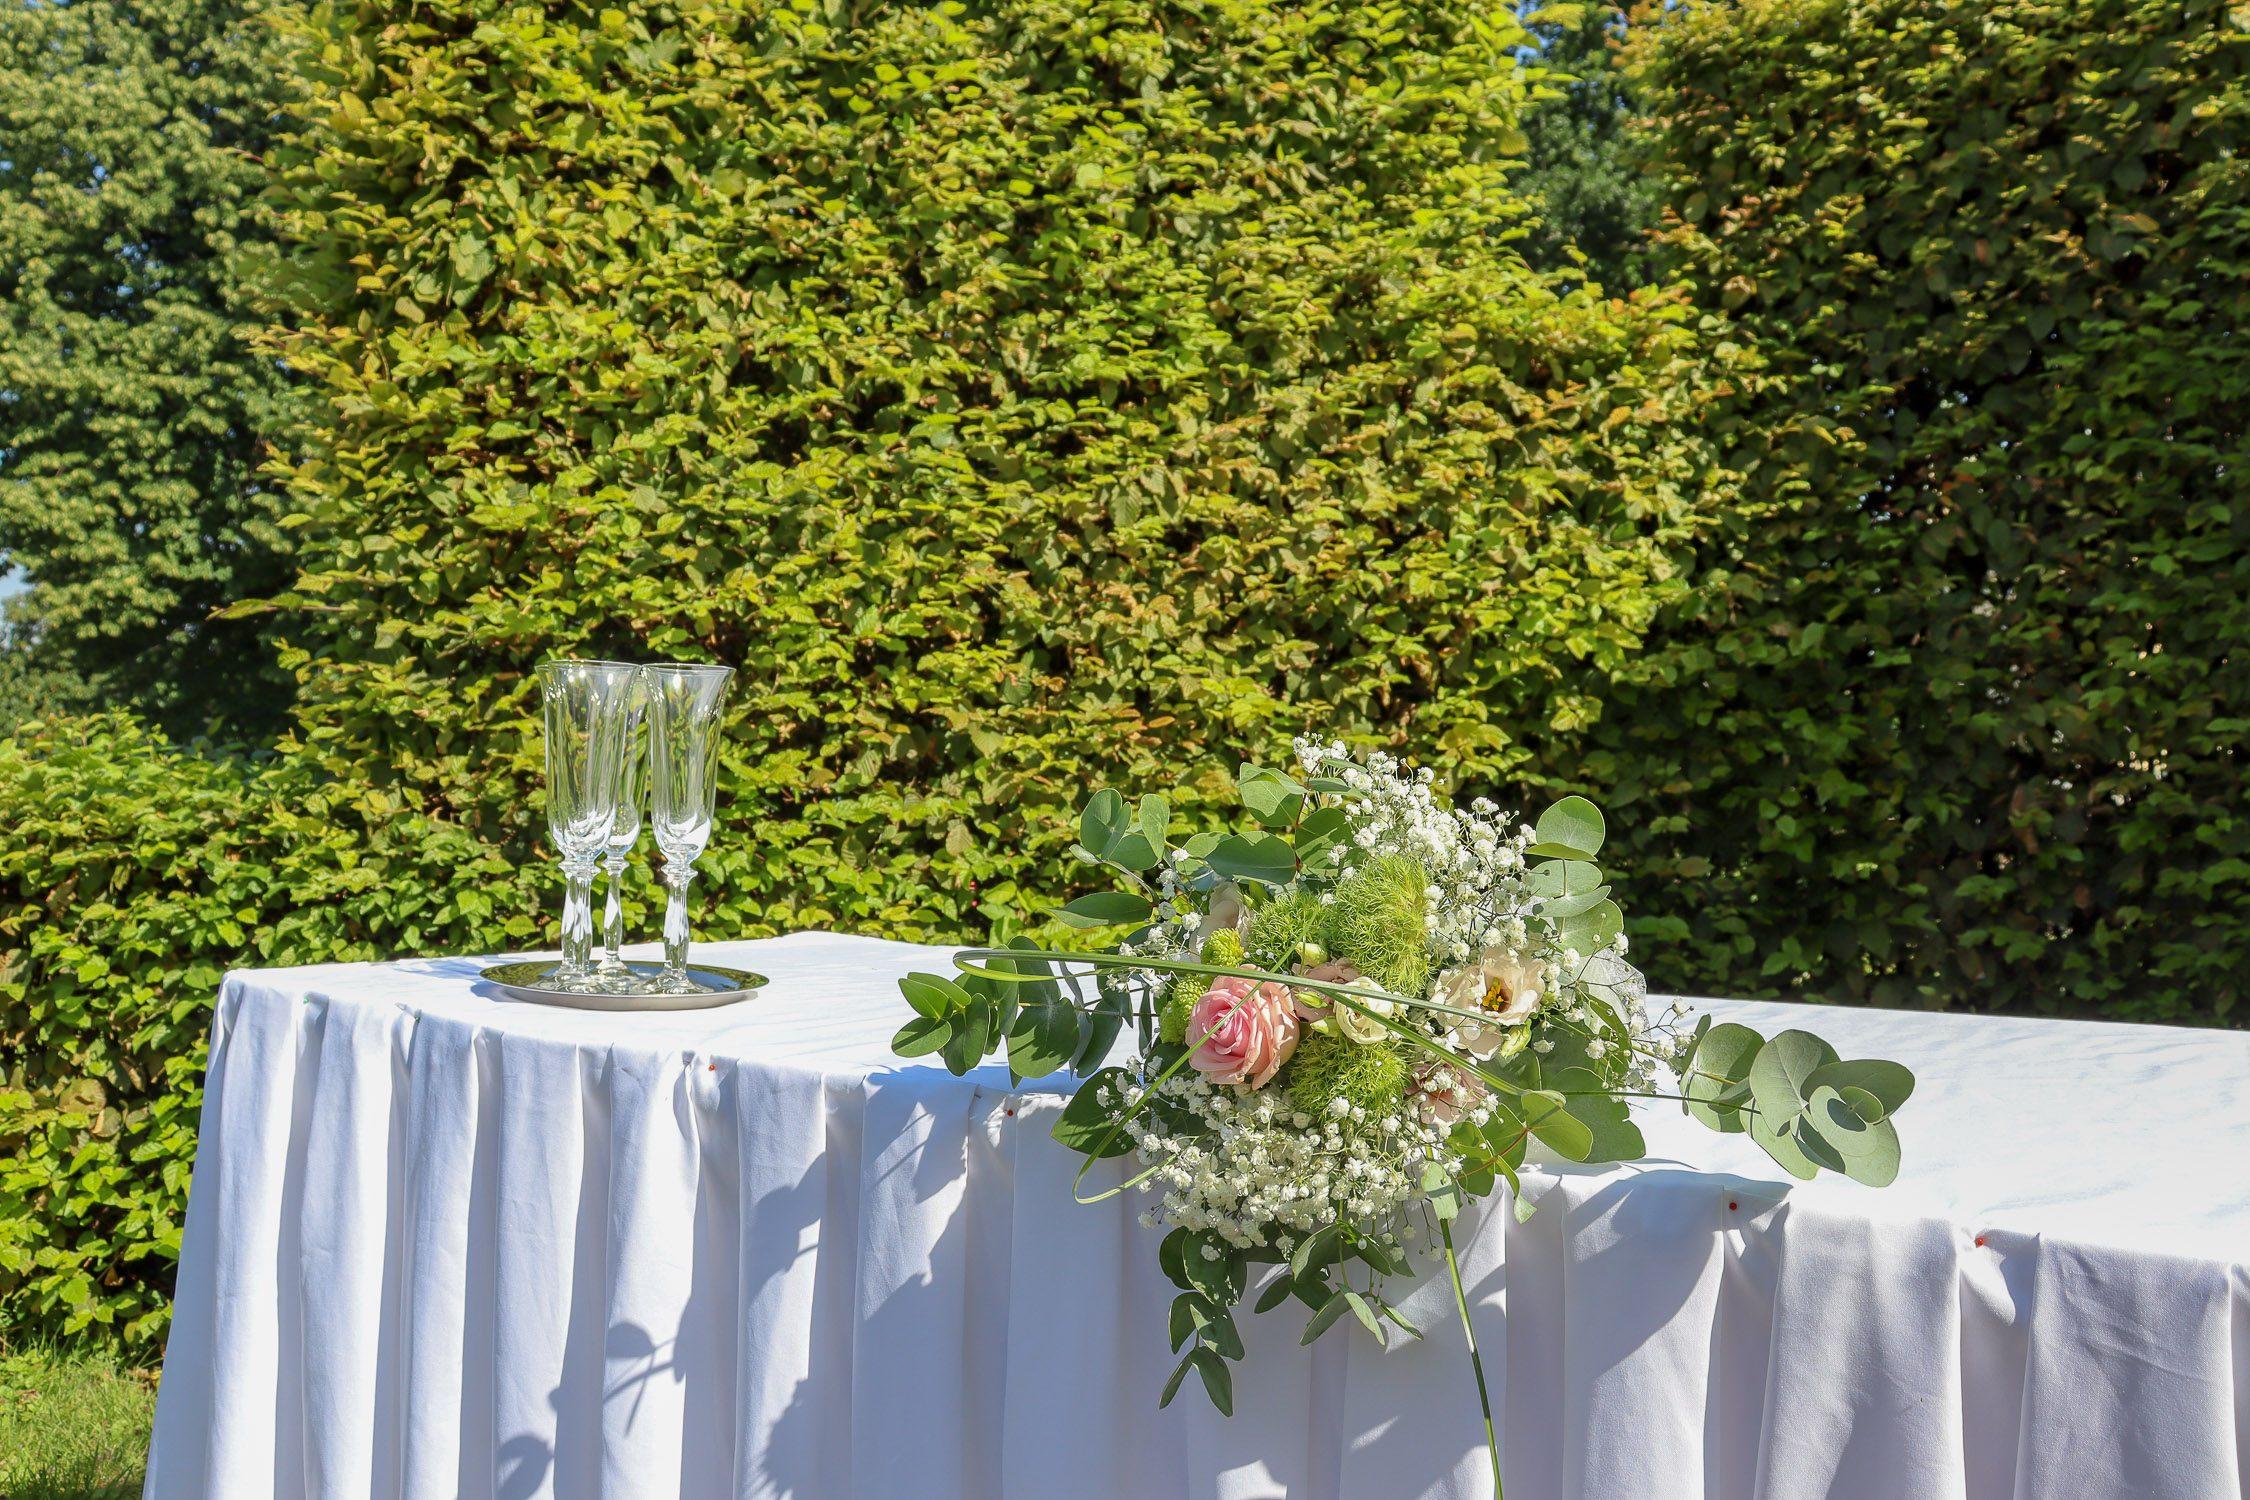 zamek_zahrada_dekorace1